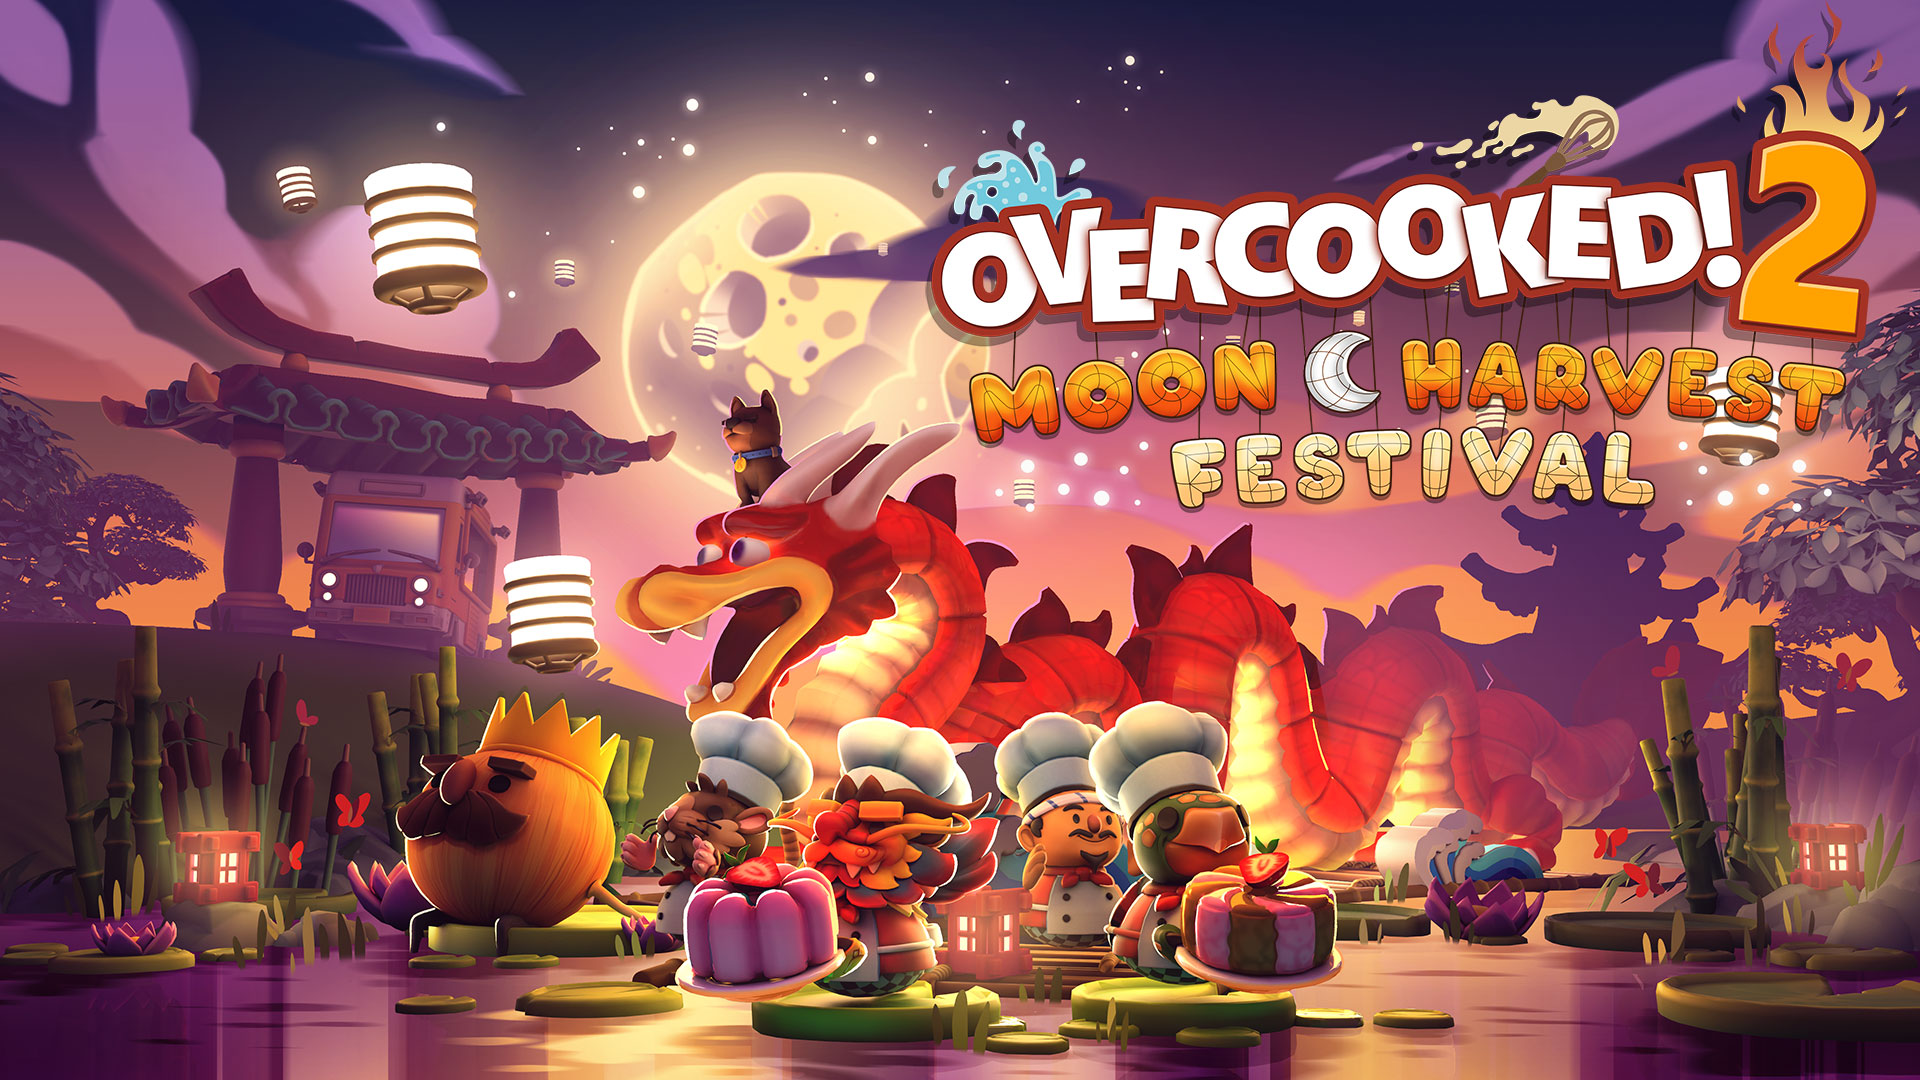 Overcooked 2 Moon Harvest Festival